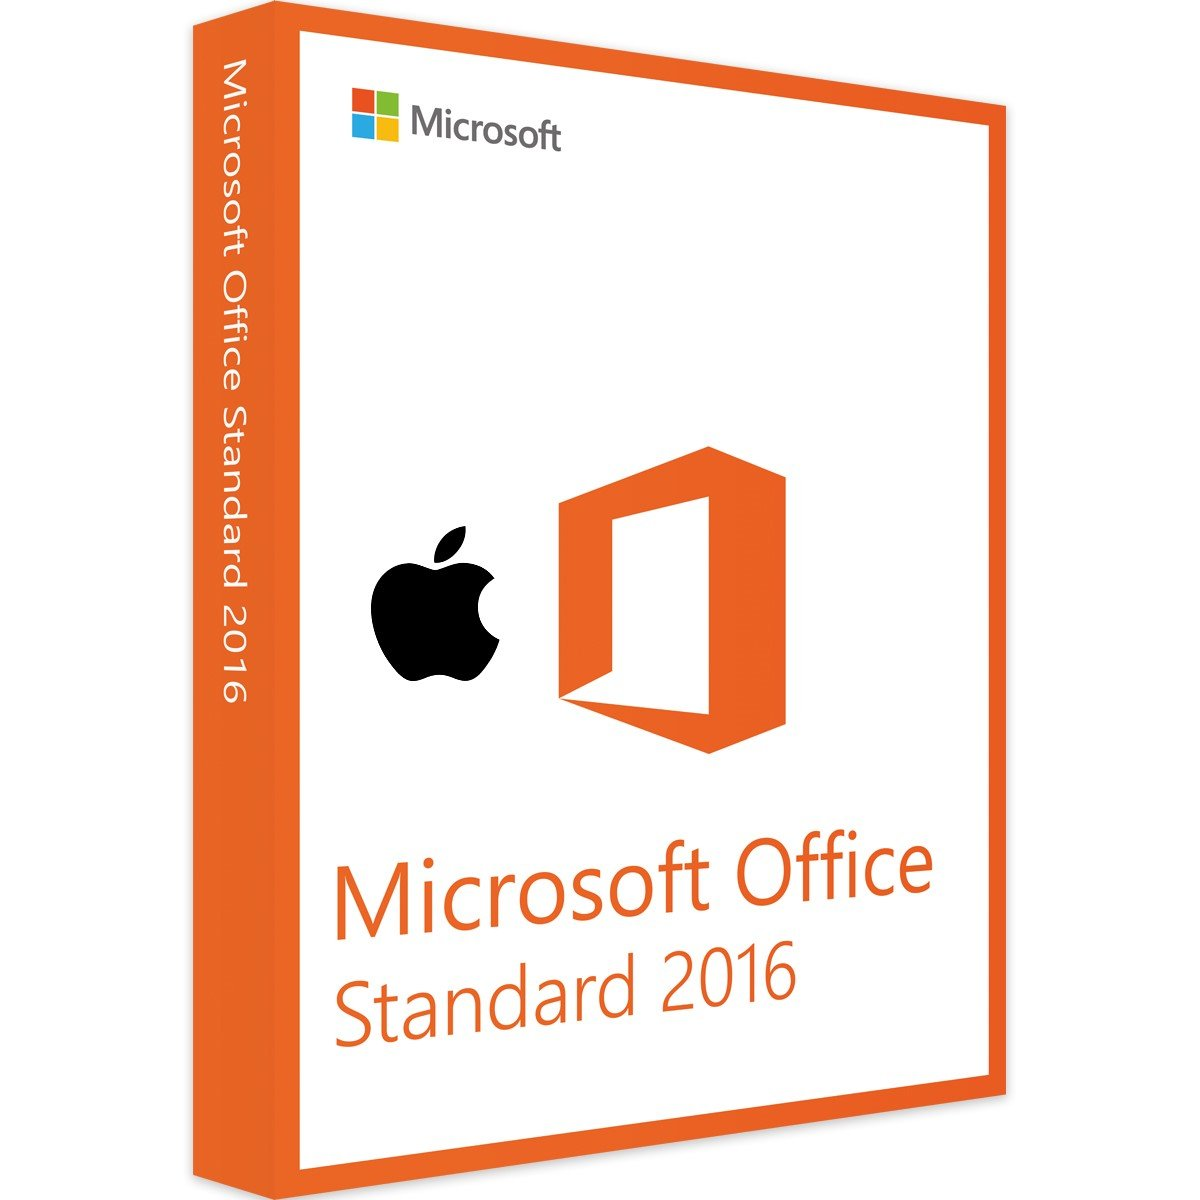 microsoft office for mac standard 2016